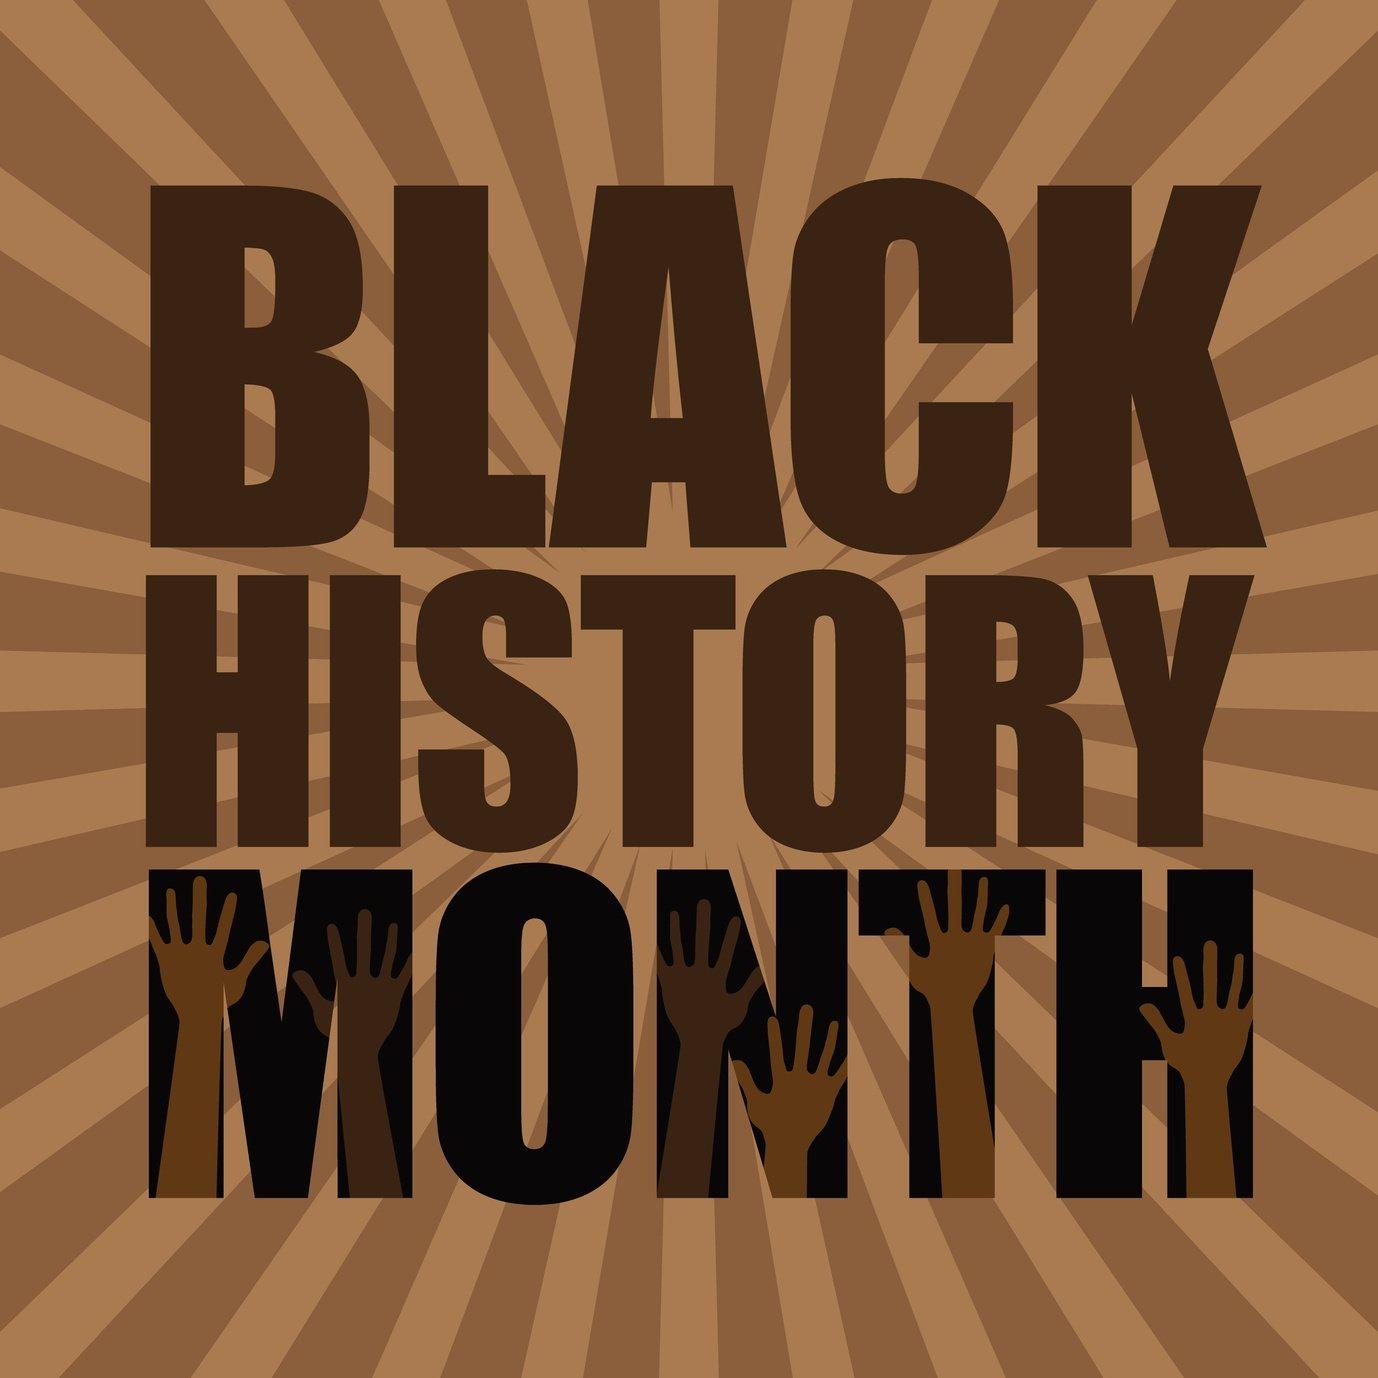 colleges celebreate black history month 2017.jpg